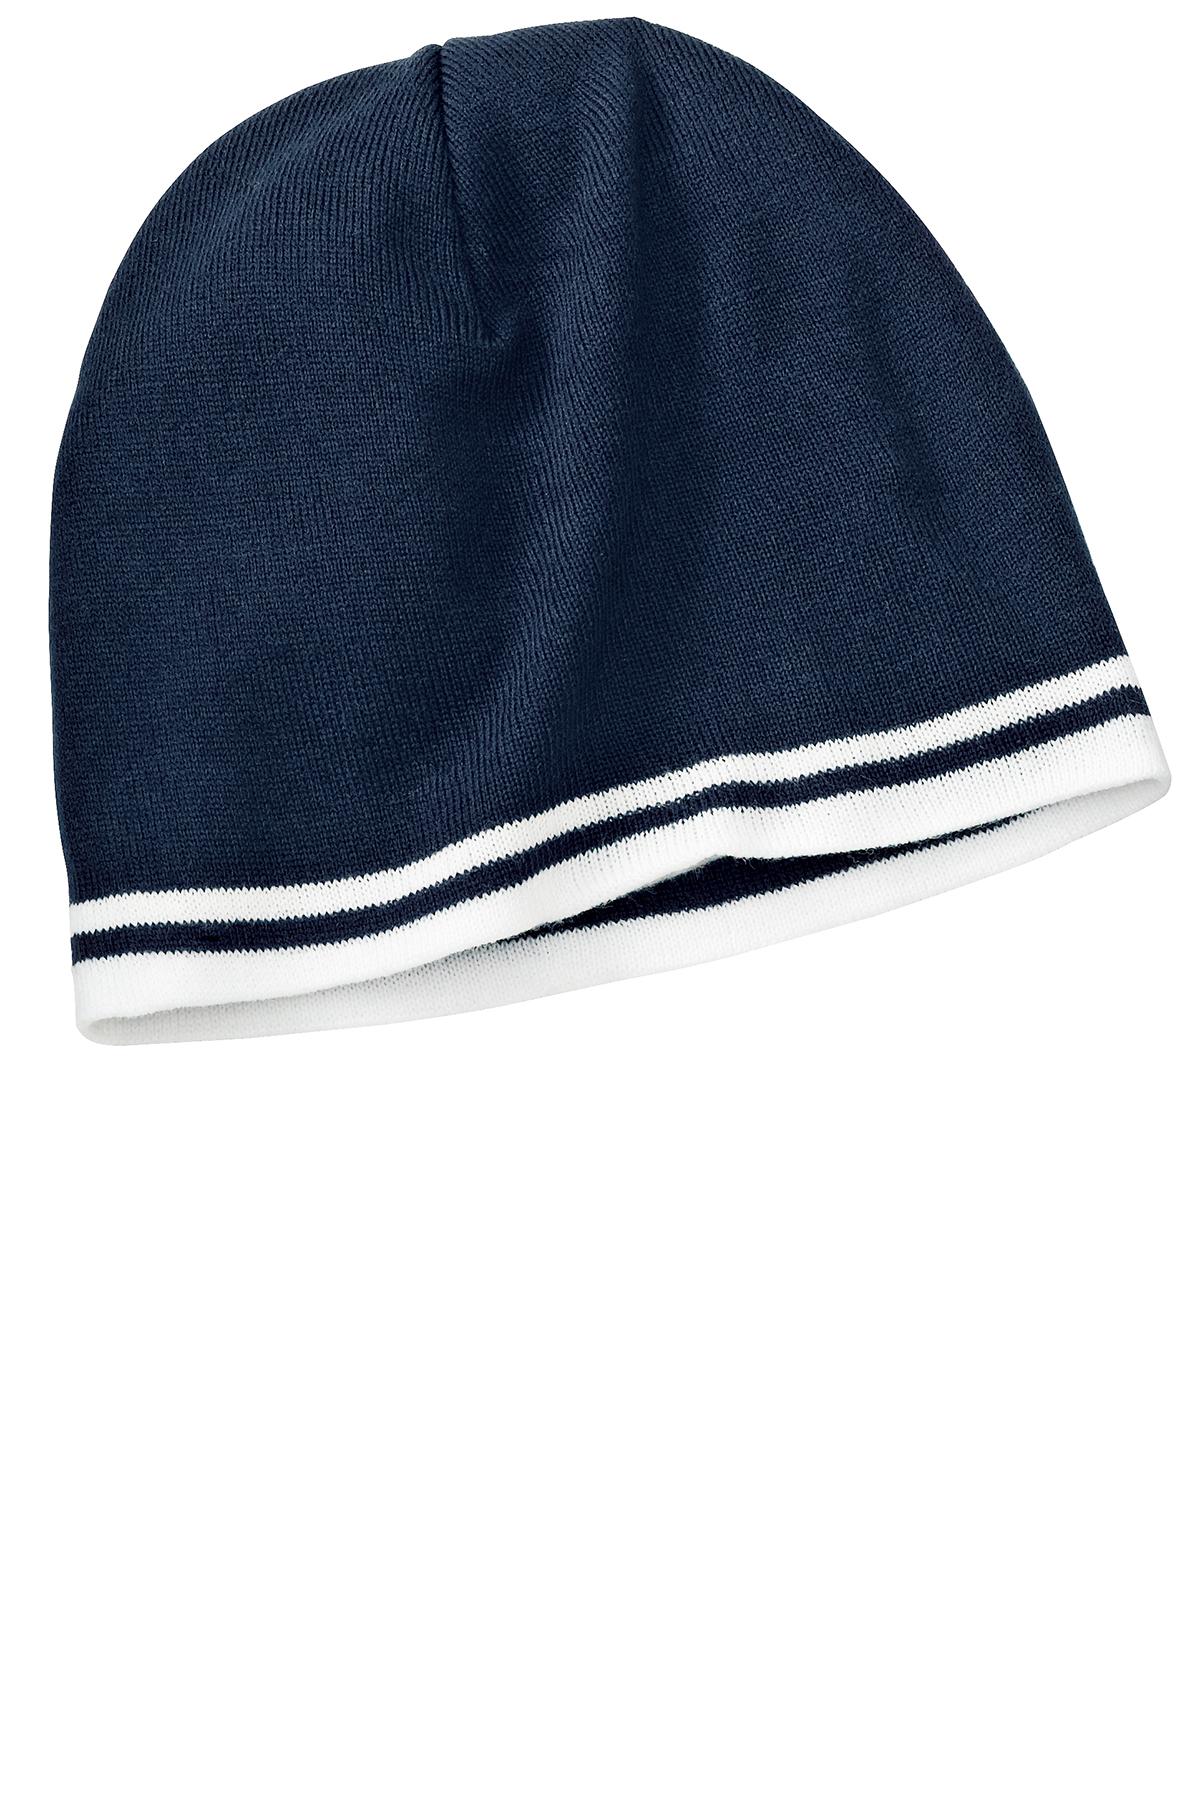 b7afb4723a9 Port   Company® - Fine Knit Skull Cap with Stripes